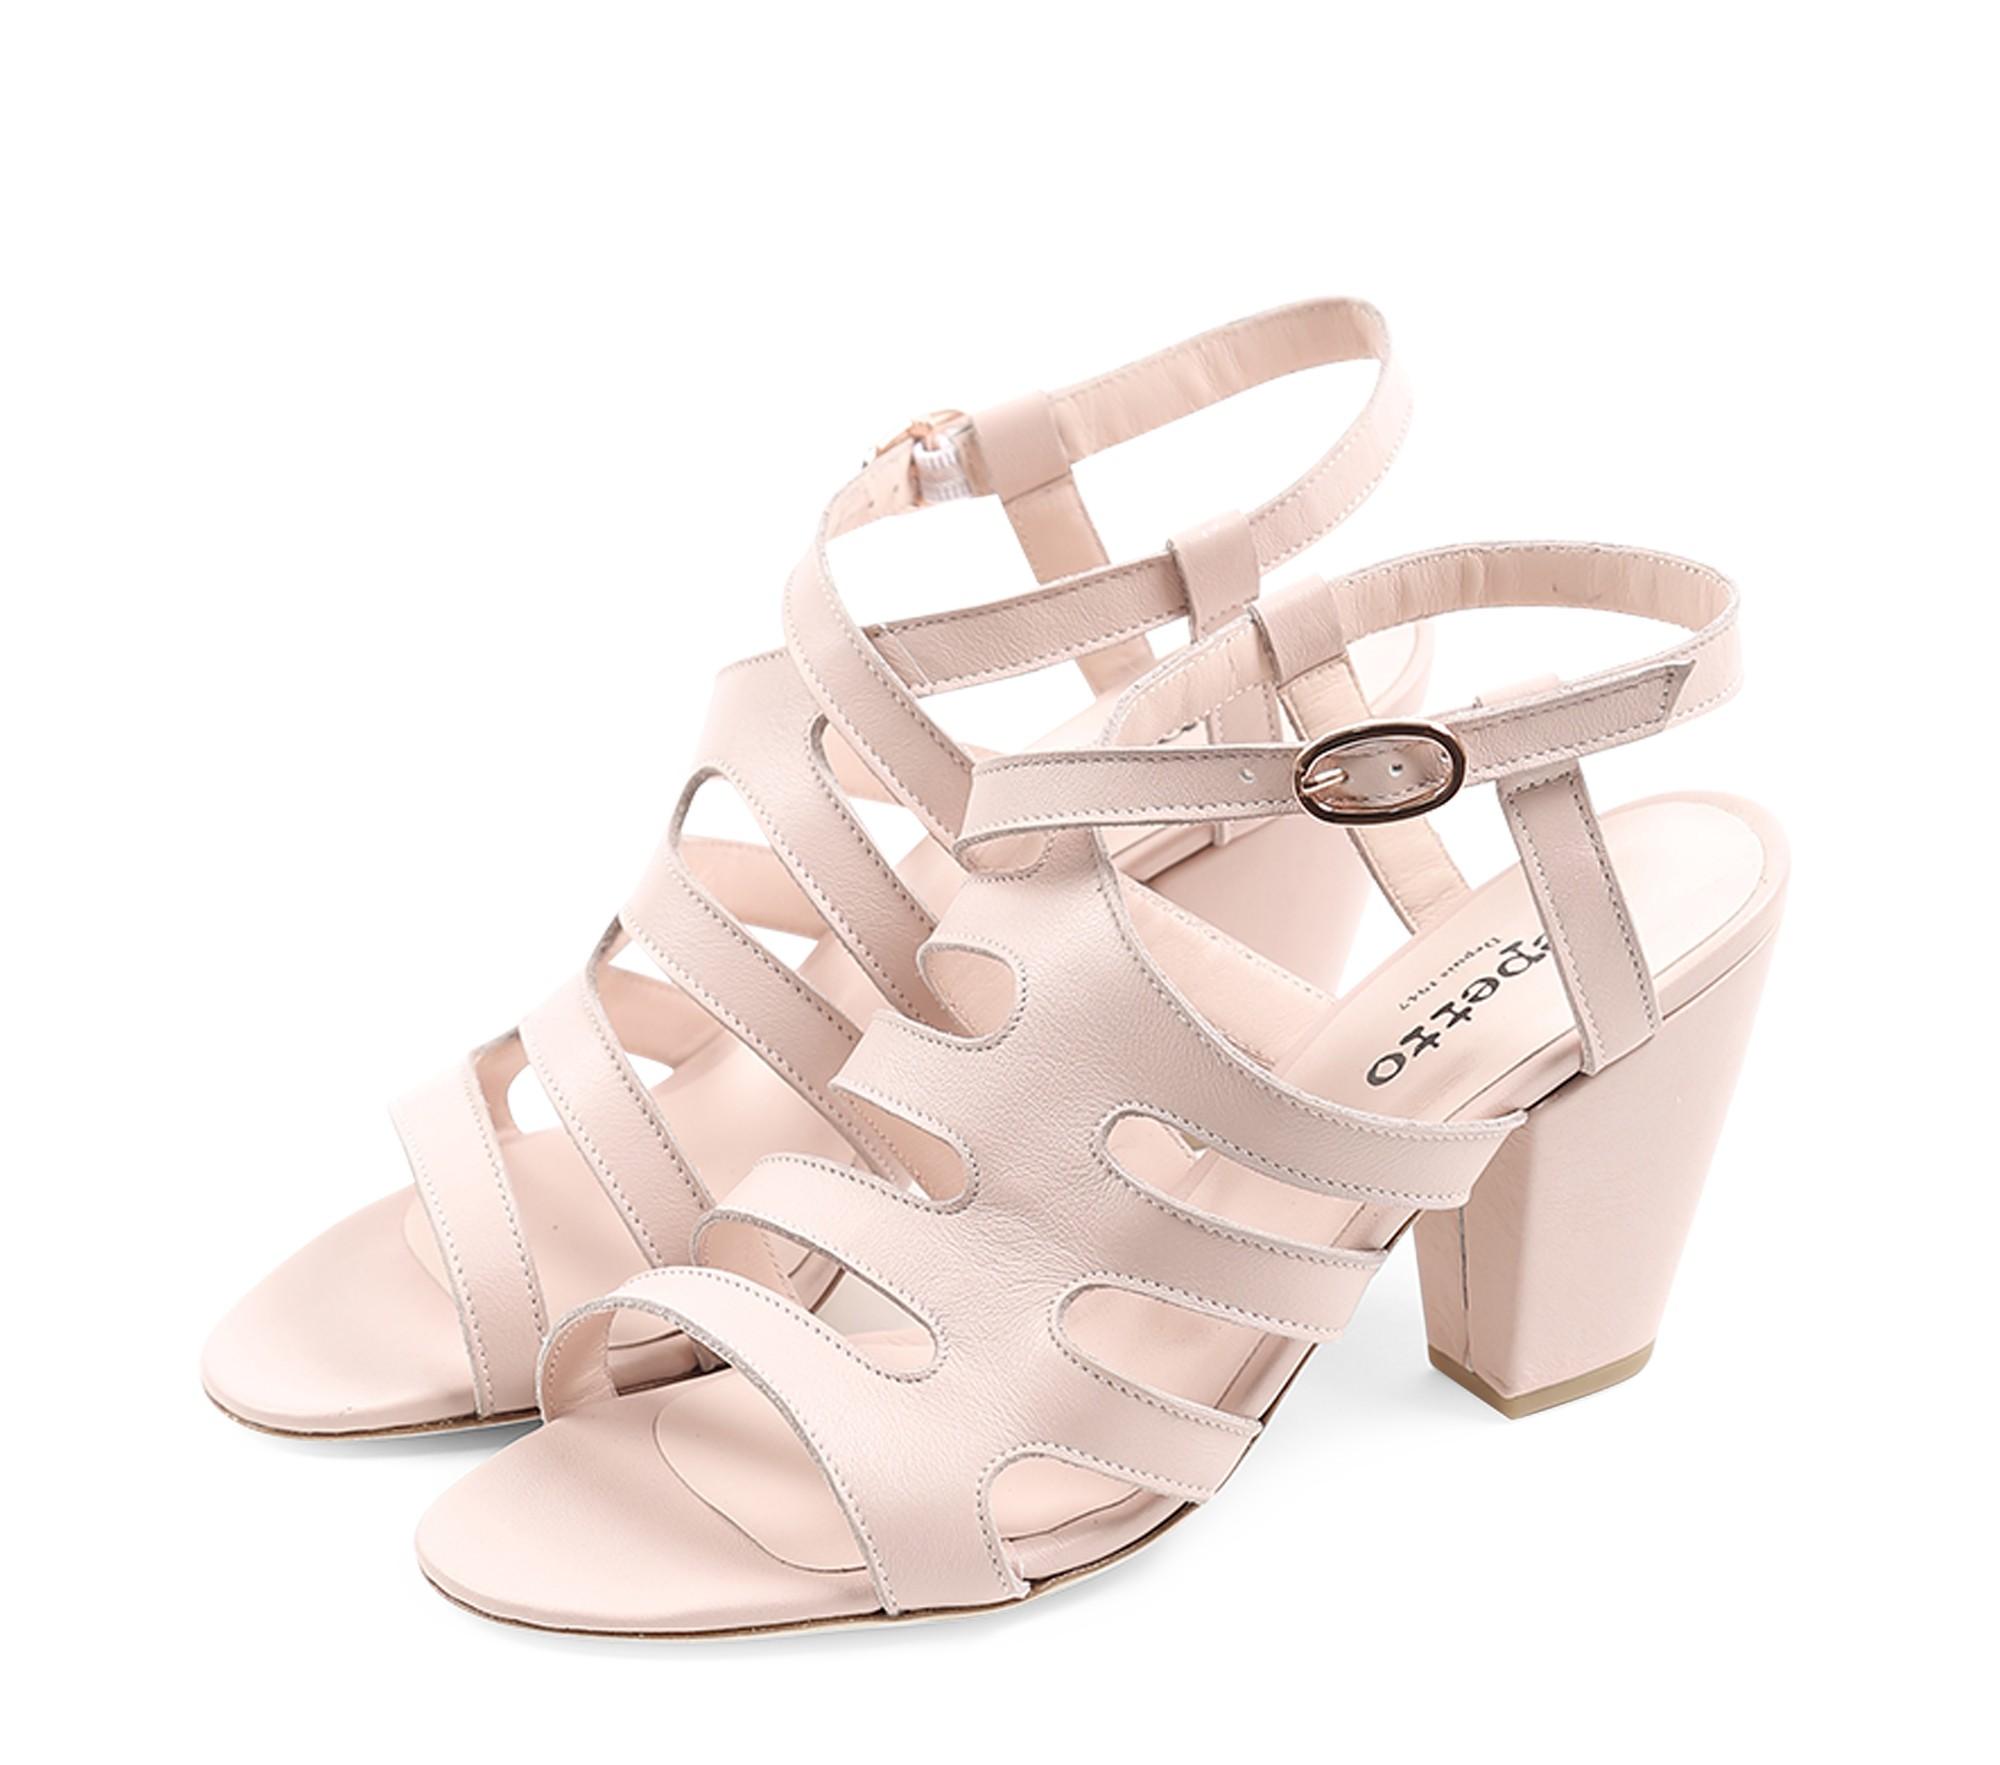 Ines sandal